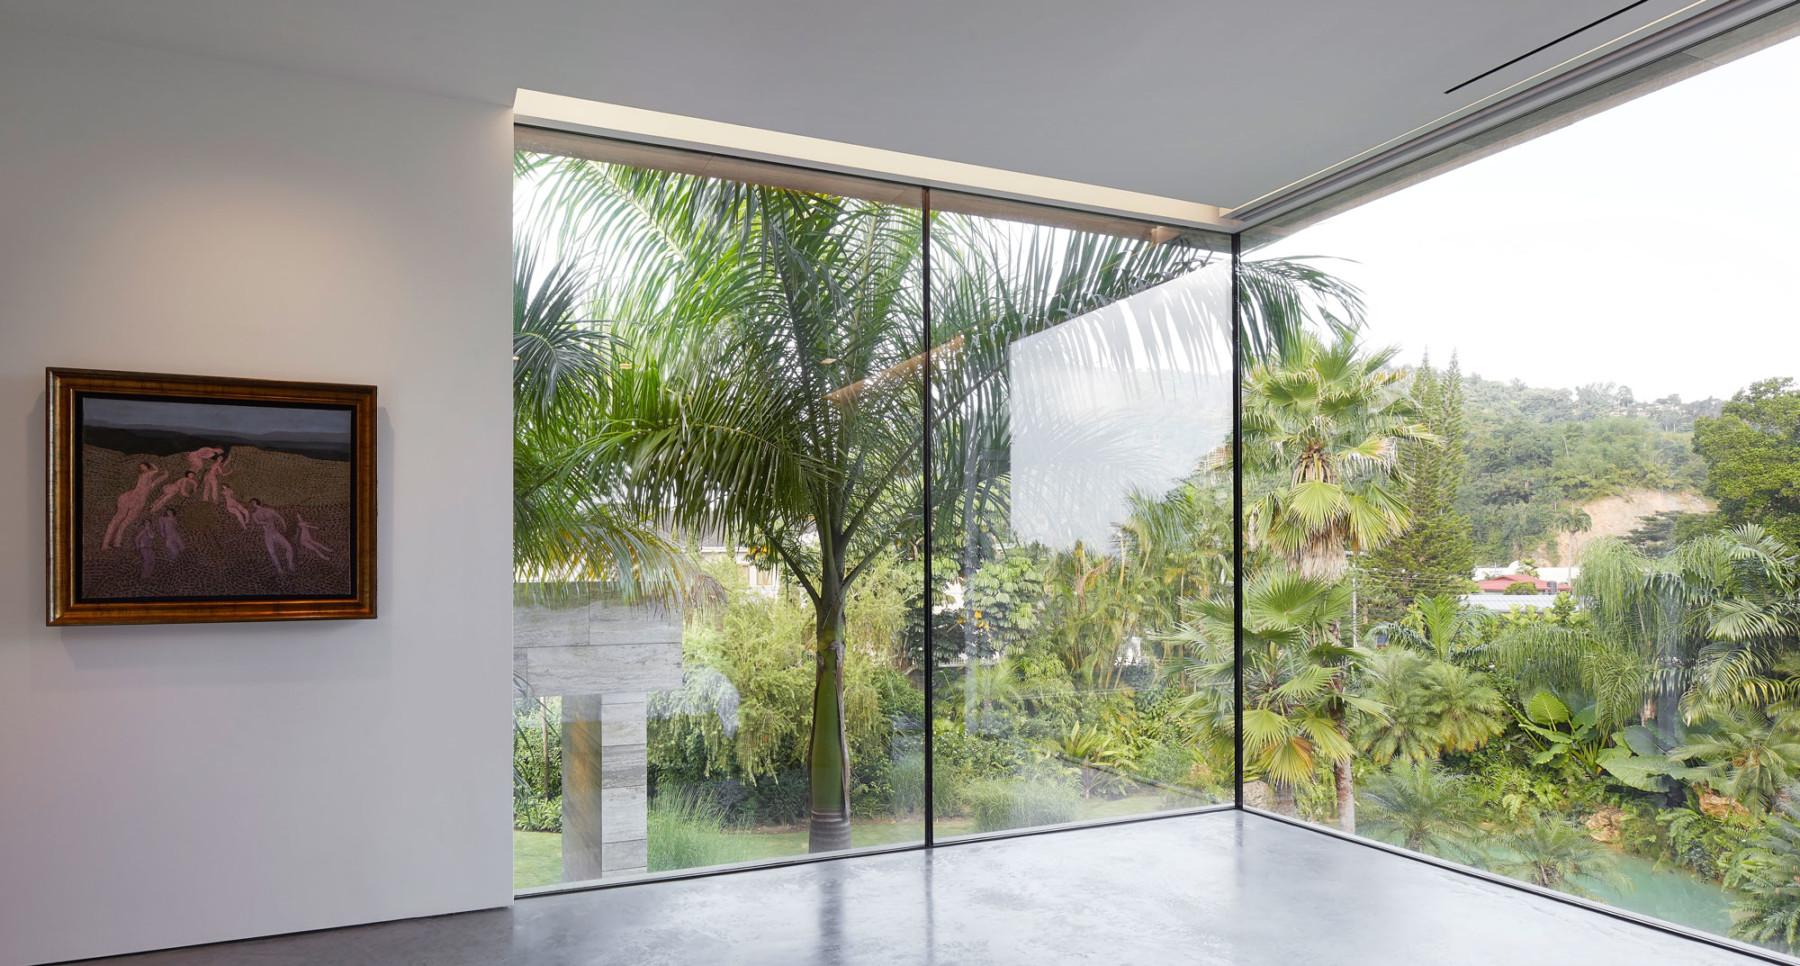 Jamie-Fobert-Architects travertine-house Port-of-Spain Trinidad Hufton+Crow 009